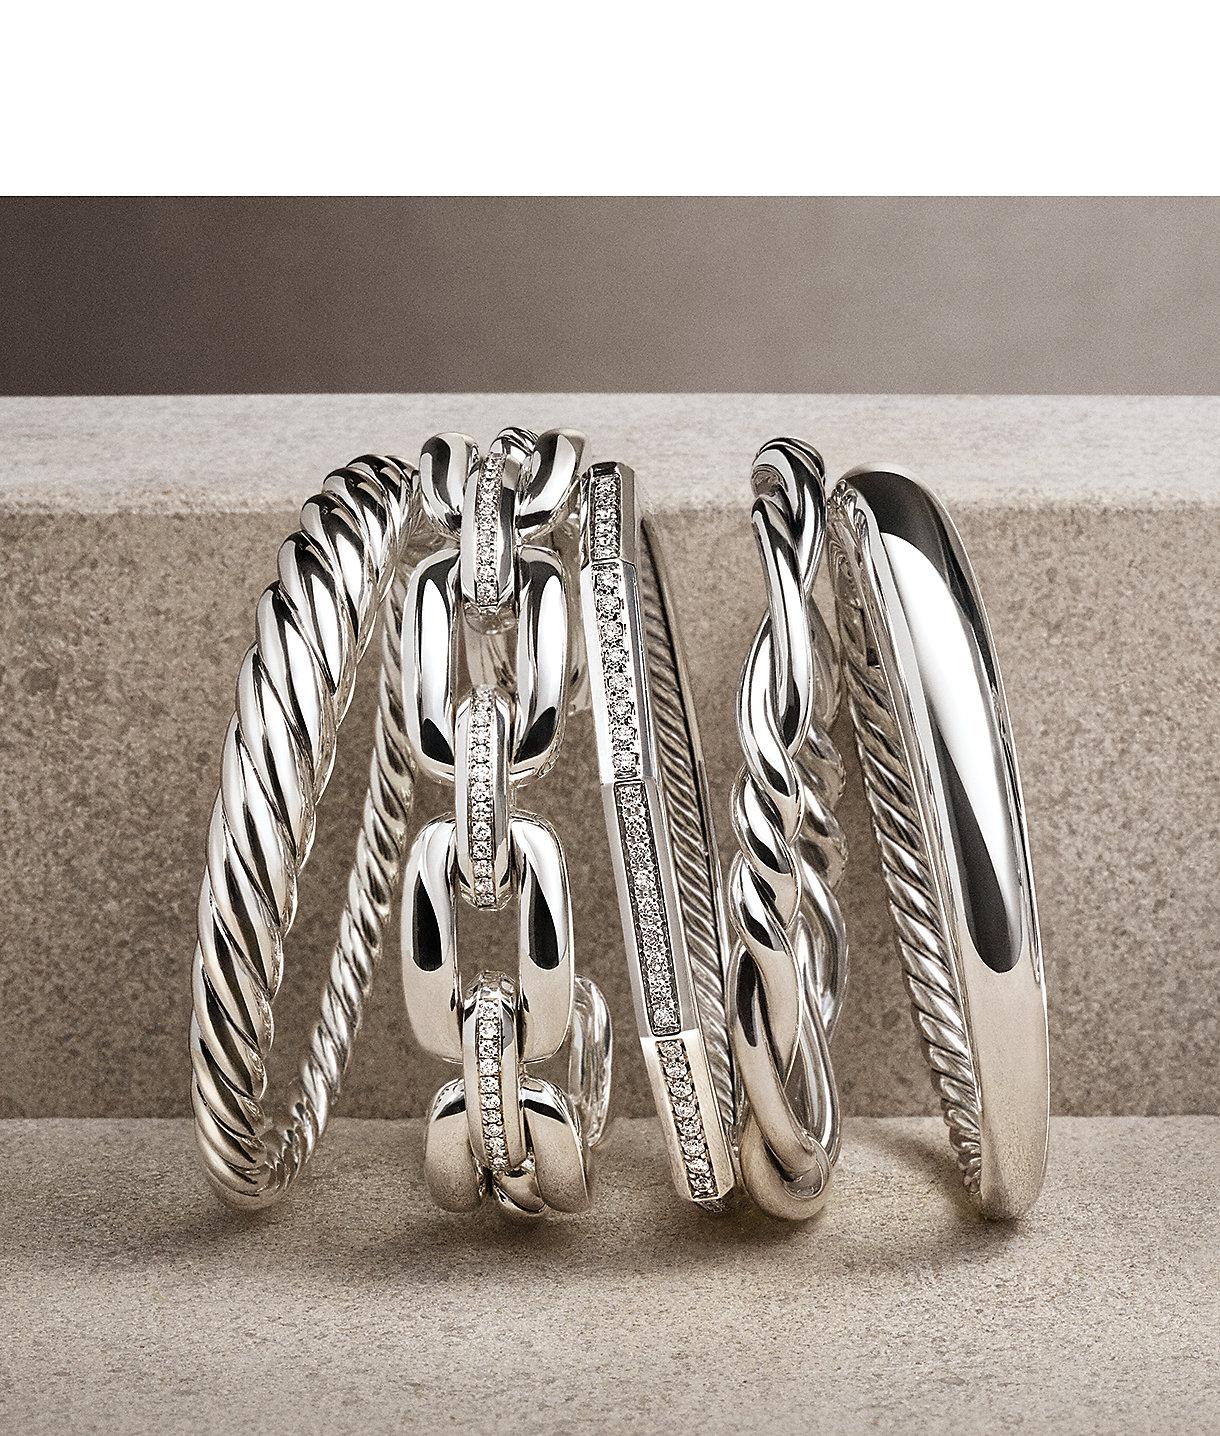 层叠925纯银DY Renaissance、Pure Form、 Stax、Continuance和Wellesley扣环手镯